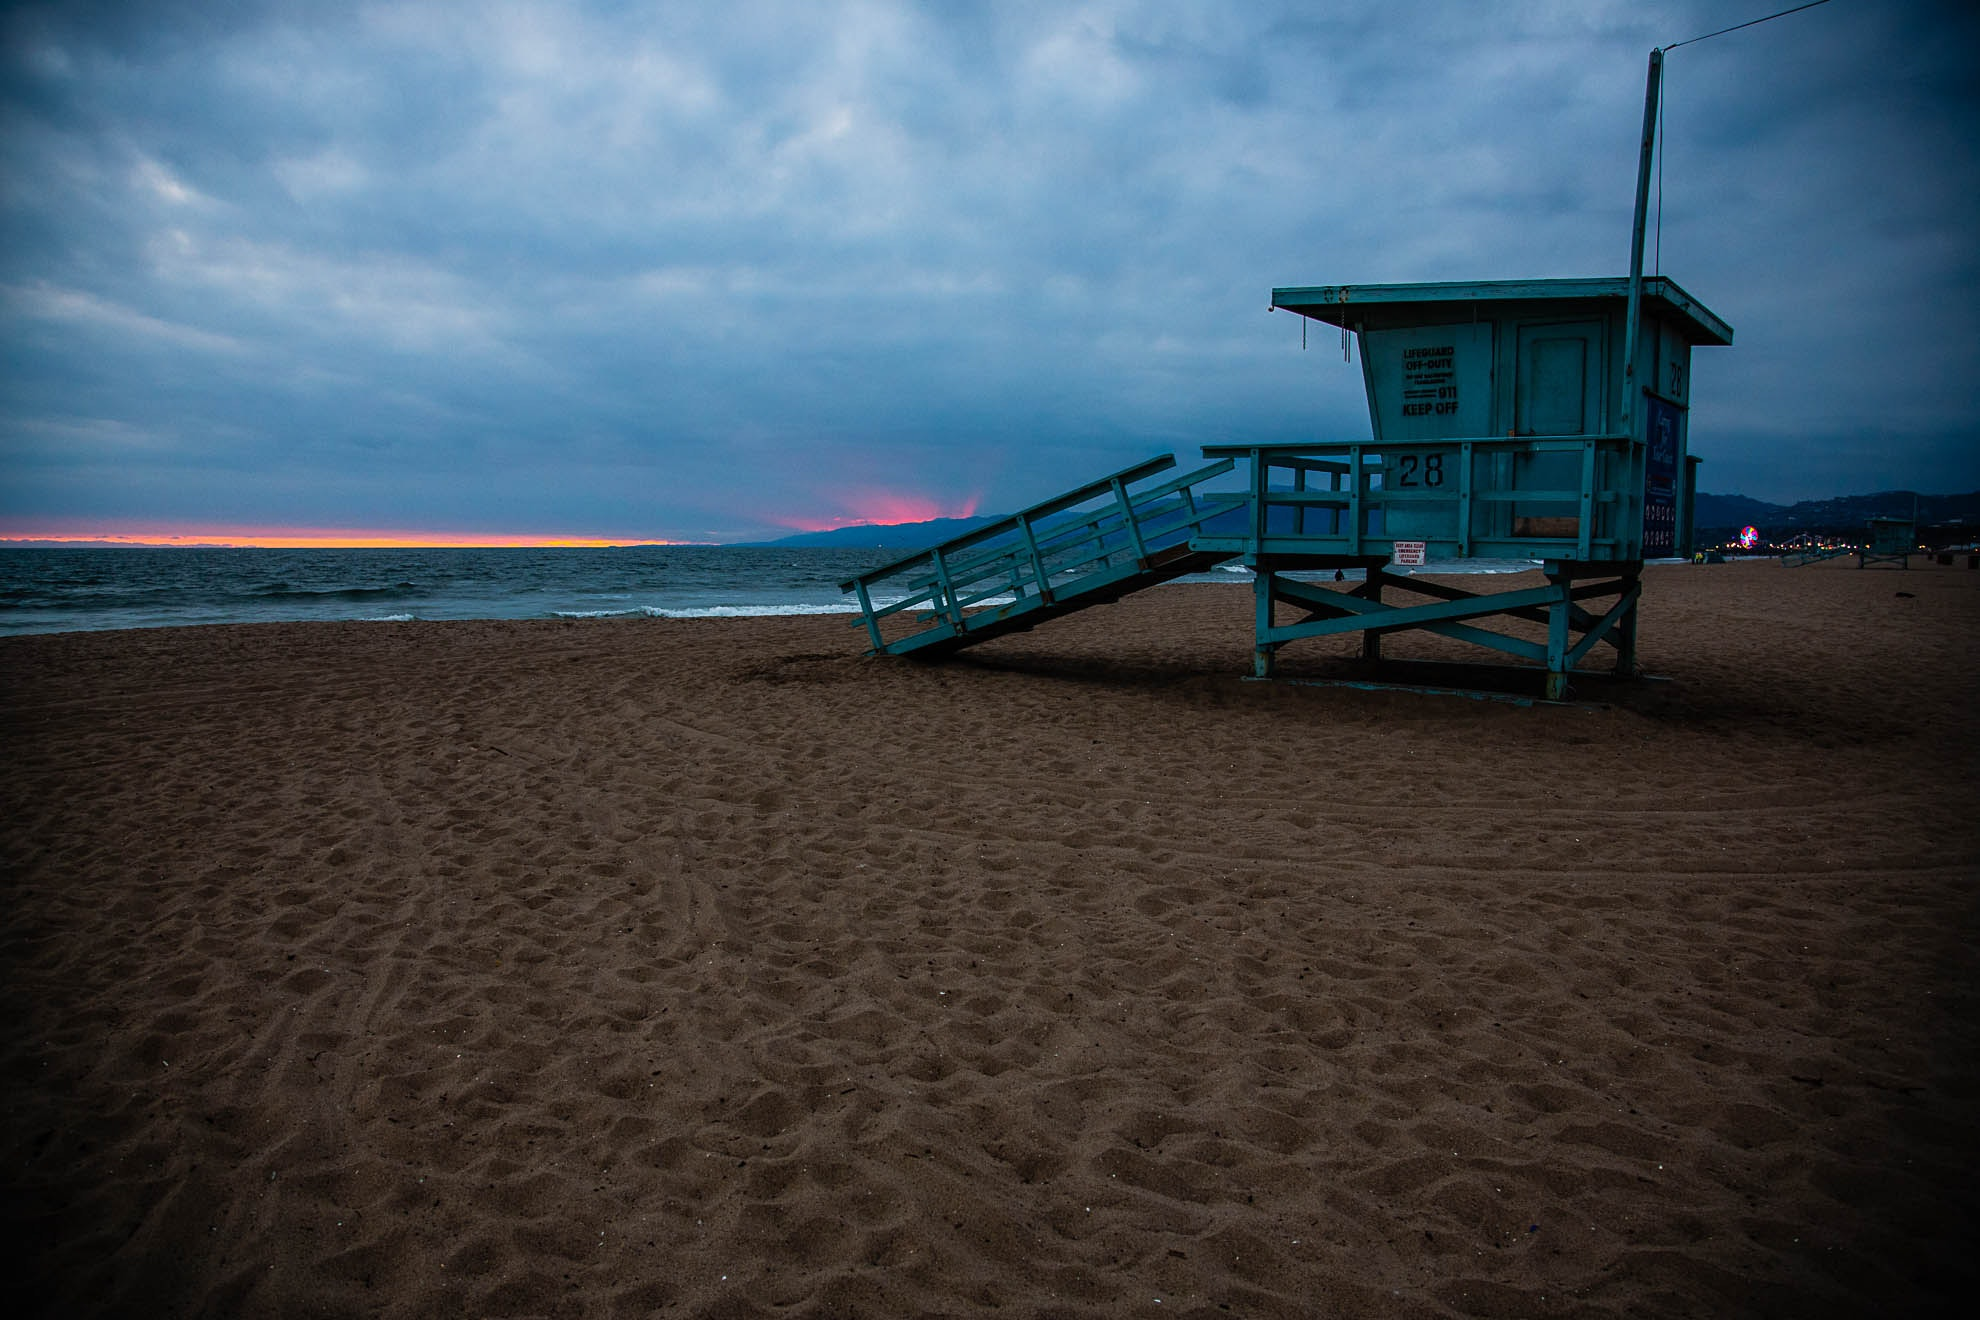 Venice Beach Sunset - With Hut